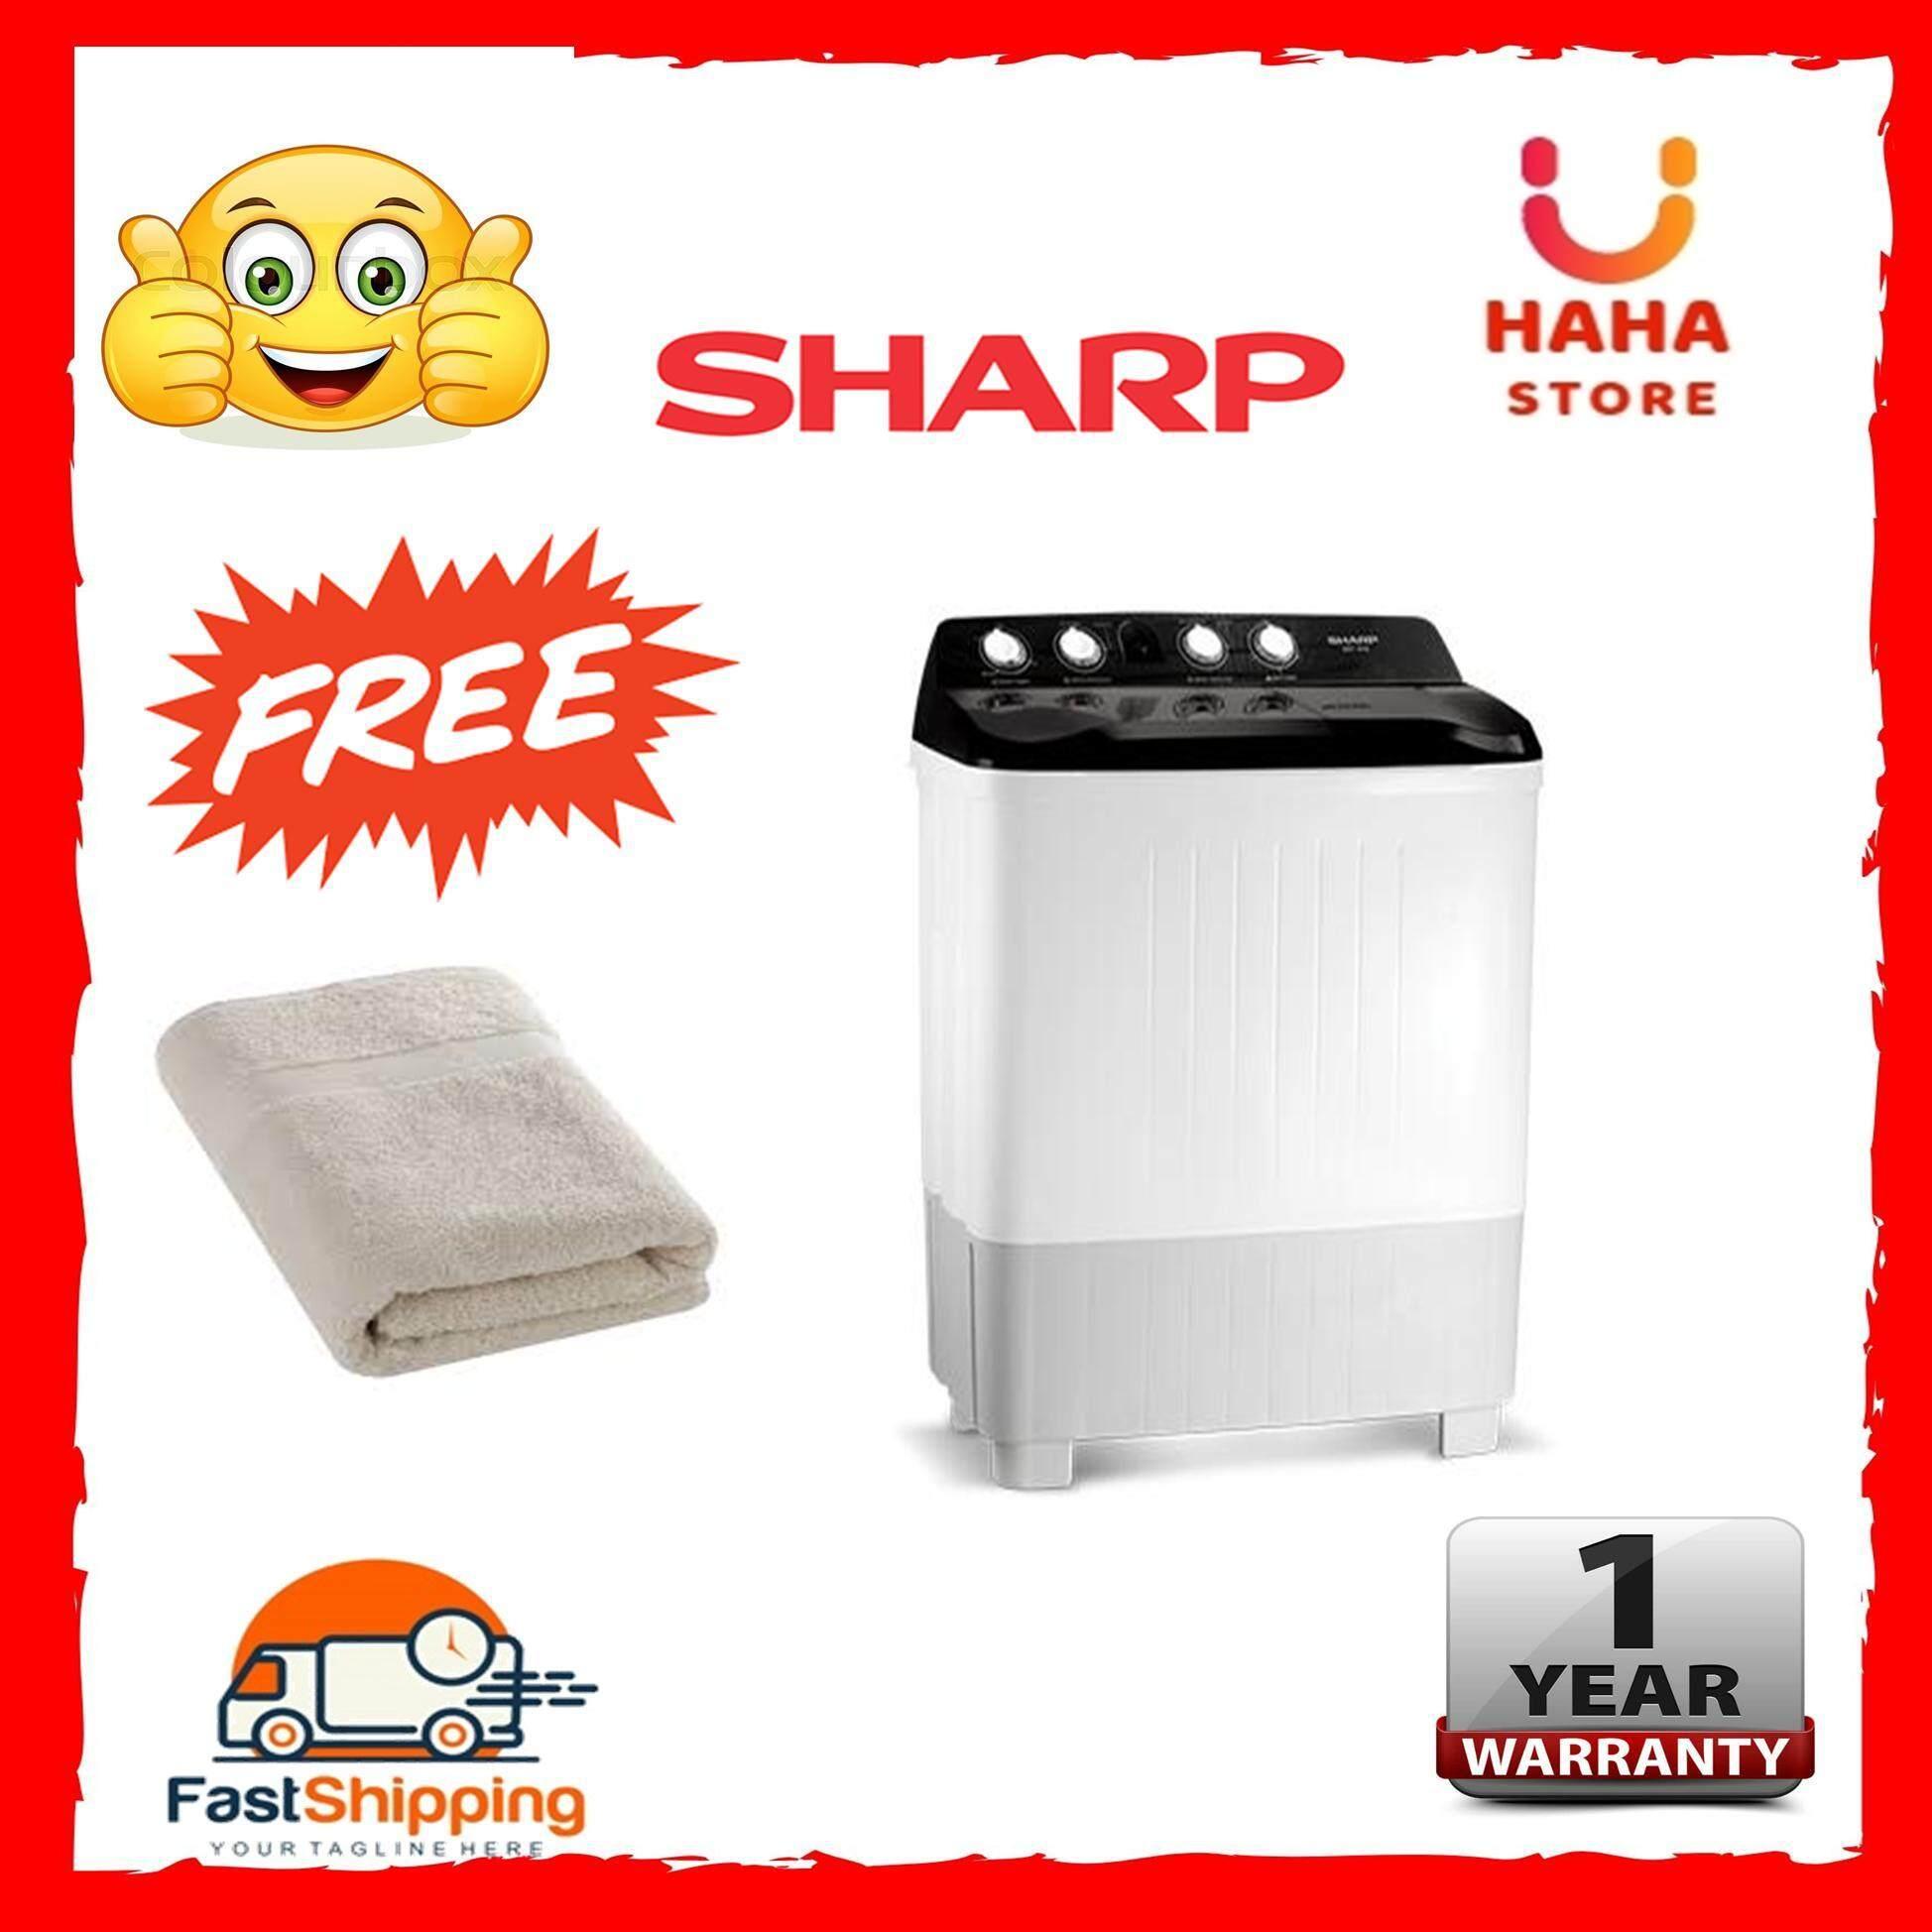 [11.11]SHARP Semi Auto Washing Machine 12KG EST-1216 (Panasonic/Samsung/Khind/Midea/Toshiba/Beko/Sony/LG/Electrolux/Daewoo/Haier)